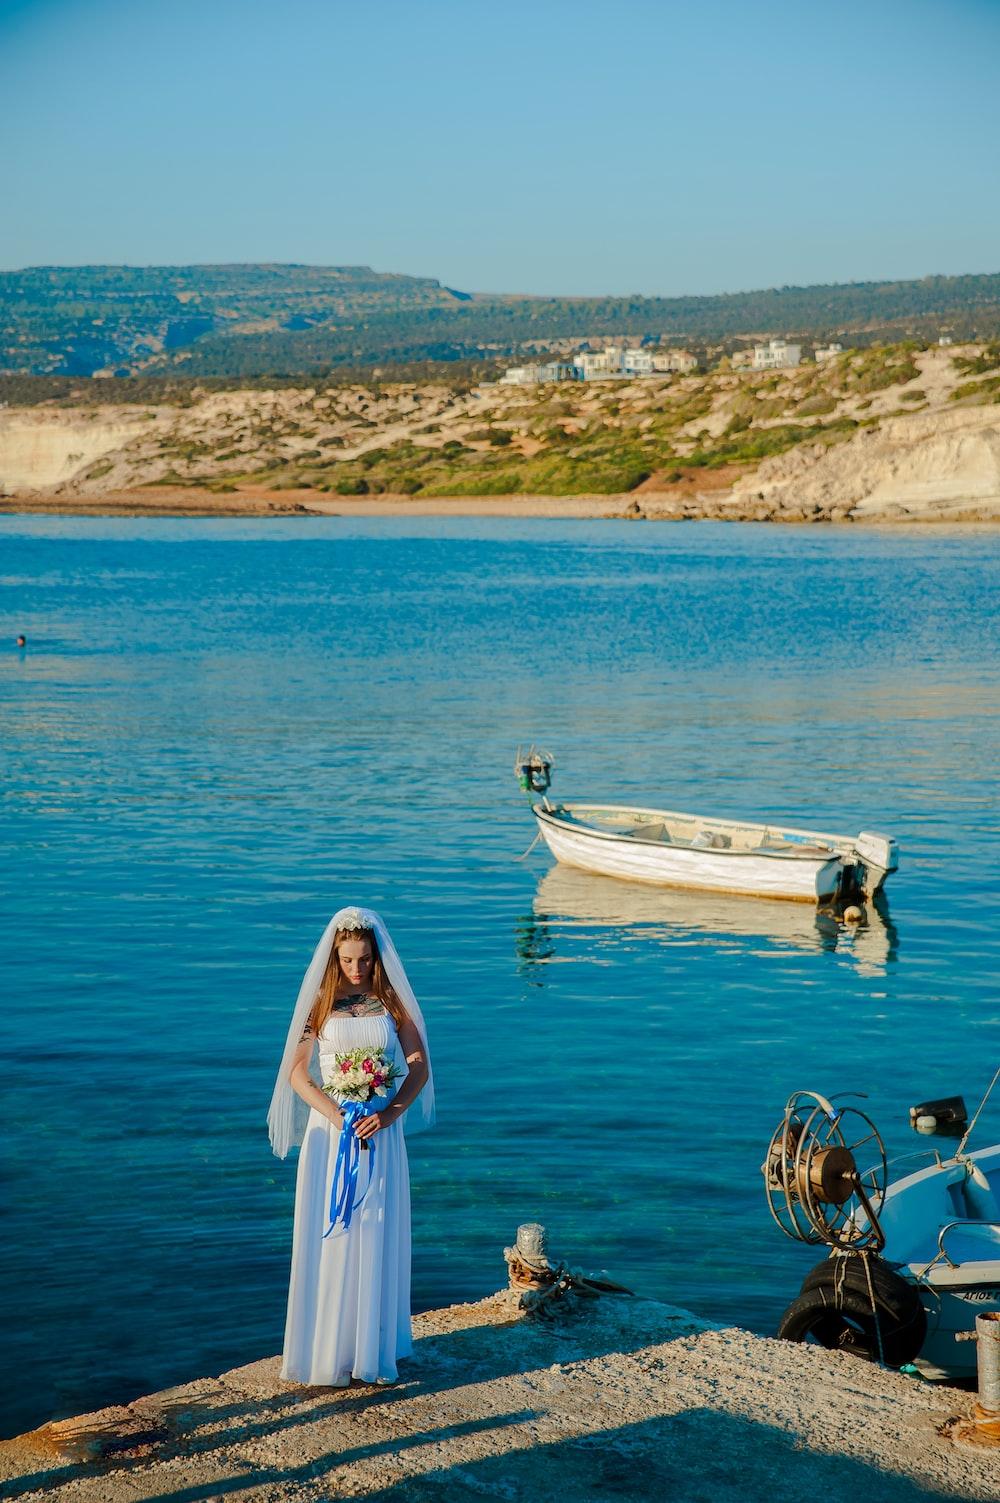 woman wearing white wedding dress standing near body of water holding flower bouquet